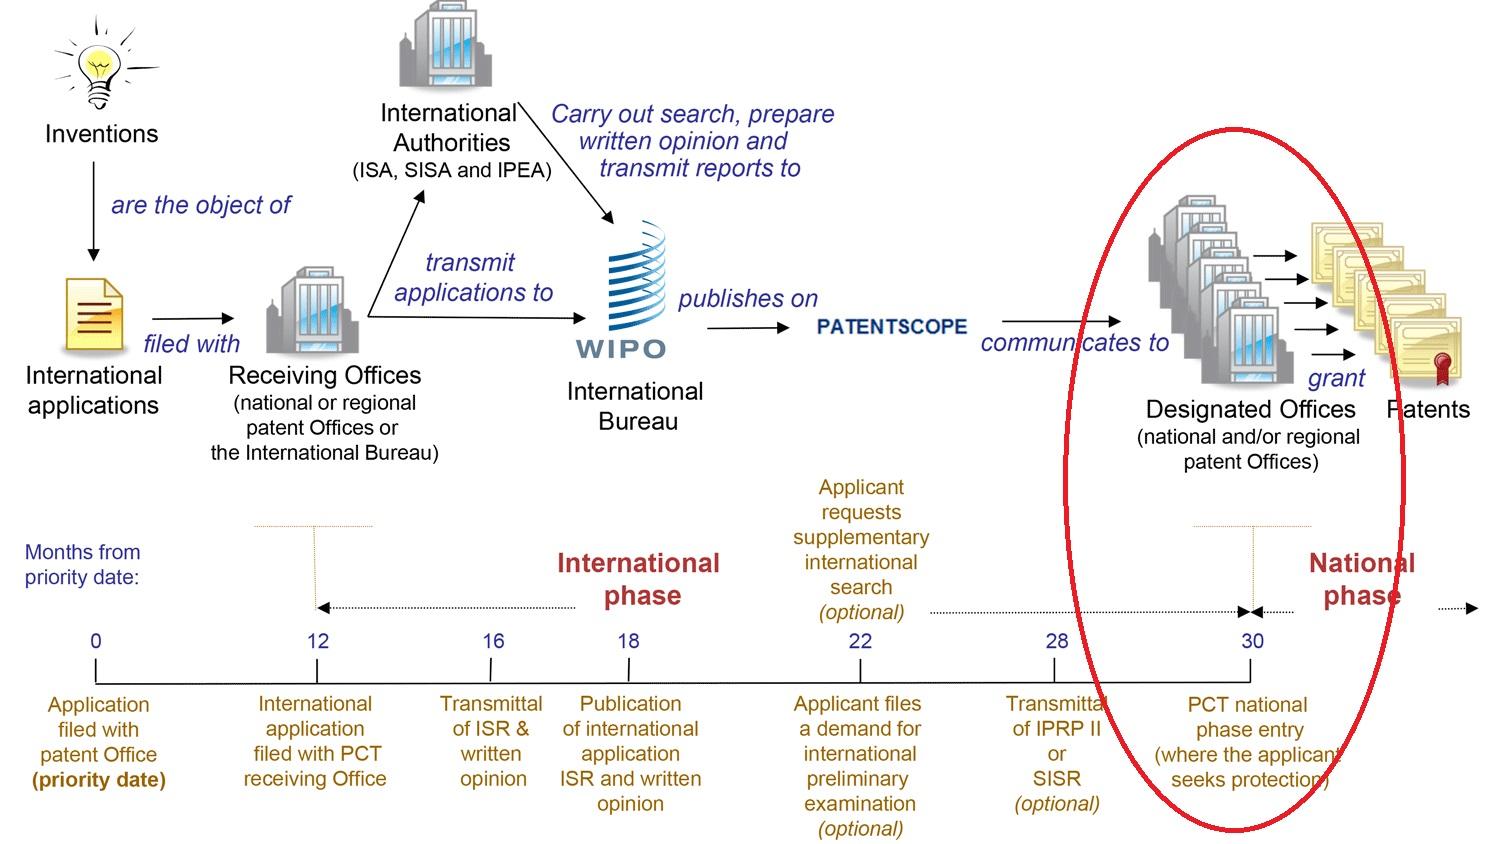 enpan's Patent & Linux practice: PCT進入國家階段筆記